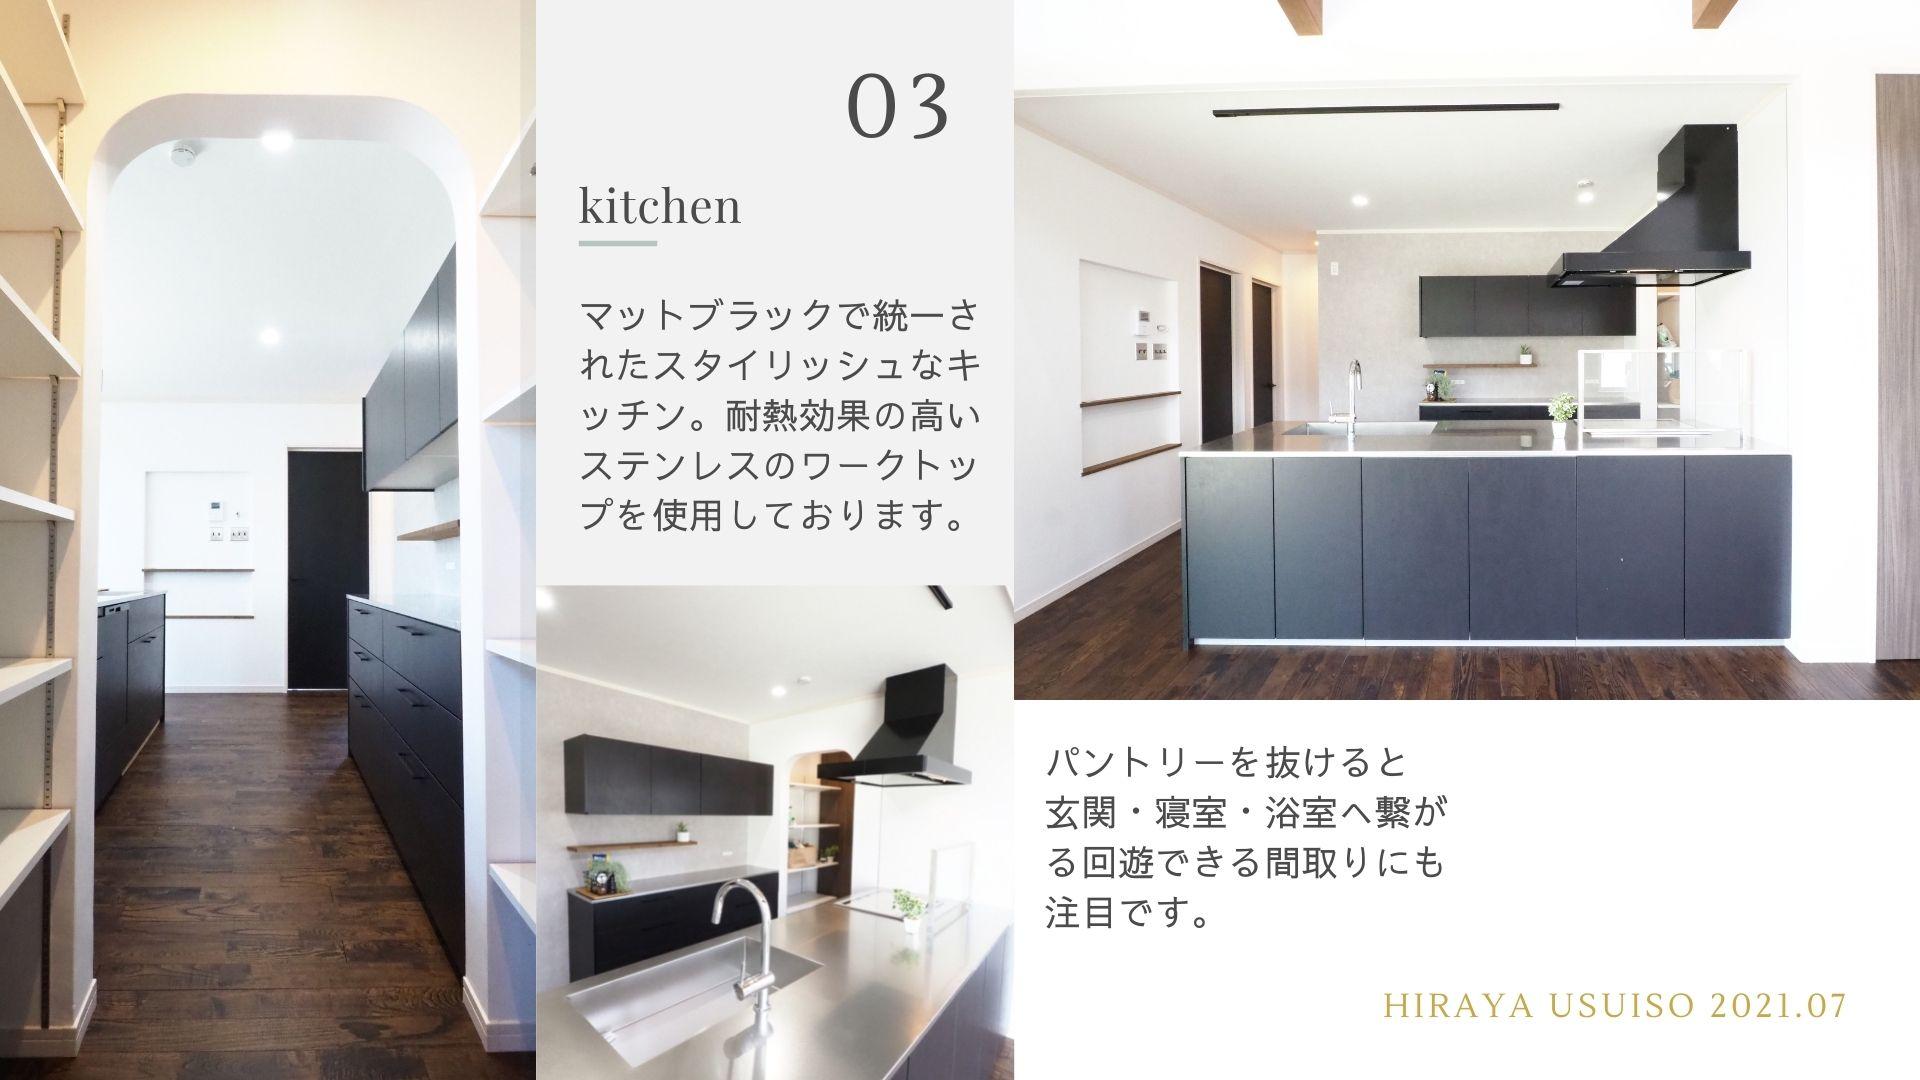 kitchen キッチン ペニンシュラ型 マットブラック ステンレスワークトップ